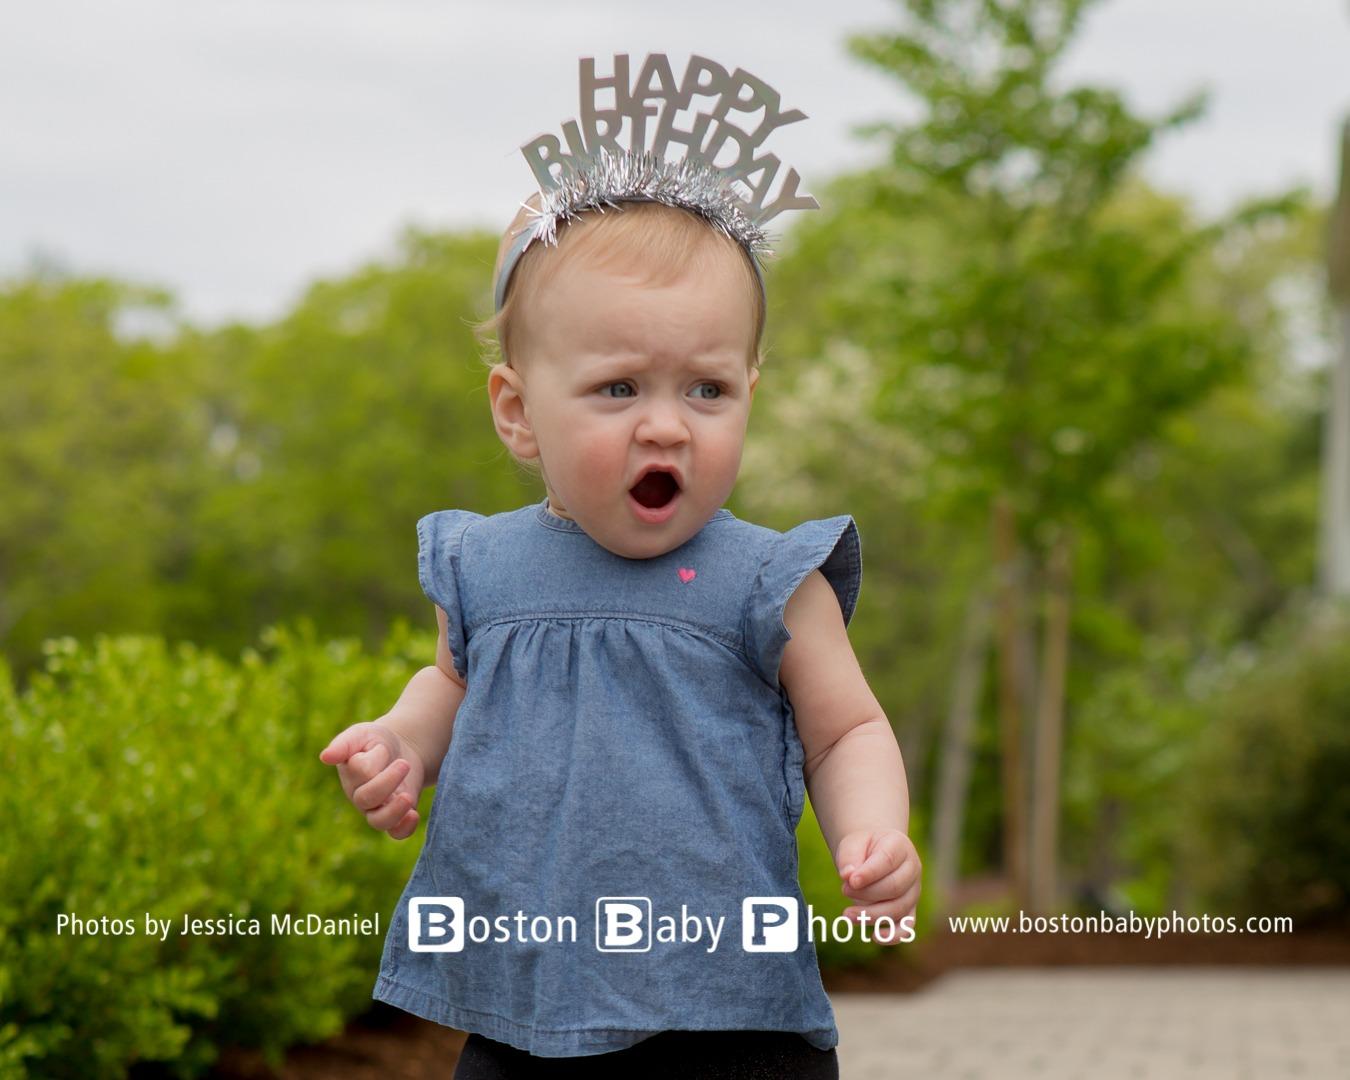 Dedham, MA: First Birthday Photoshoot